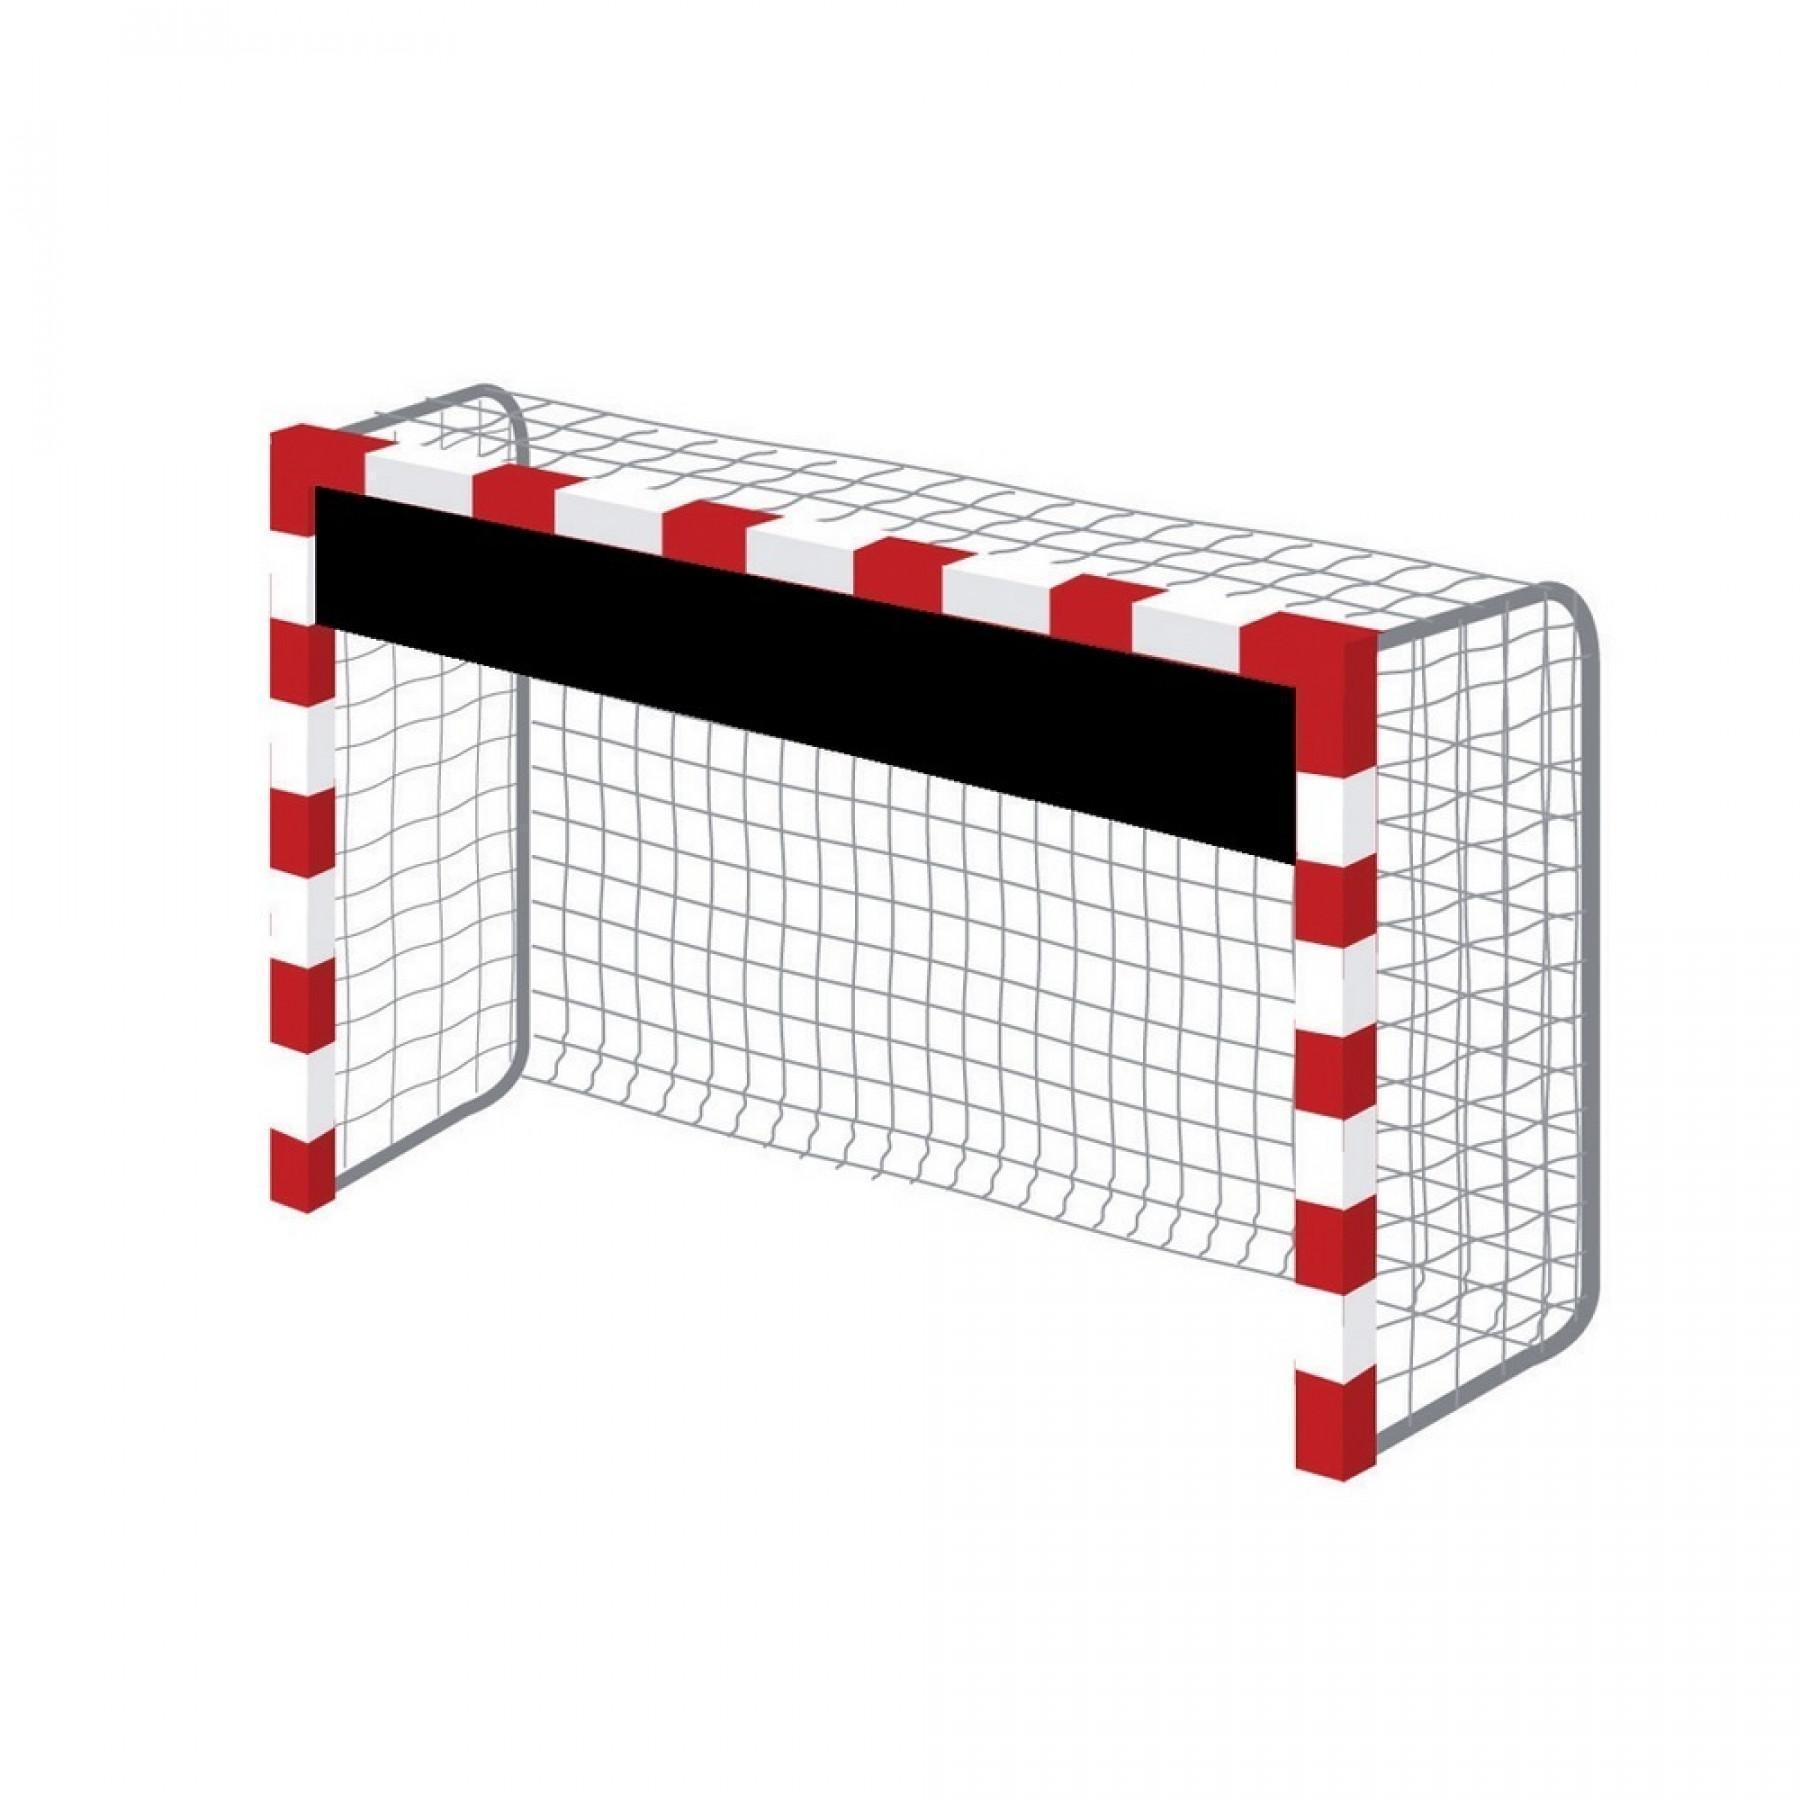 Tremblay cage reducer (3m x 30 cm)